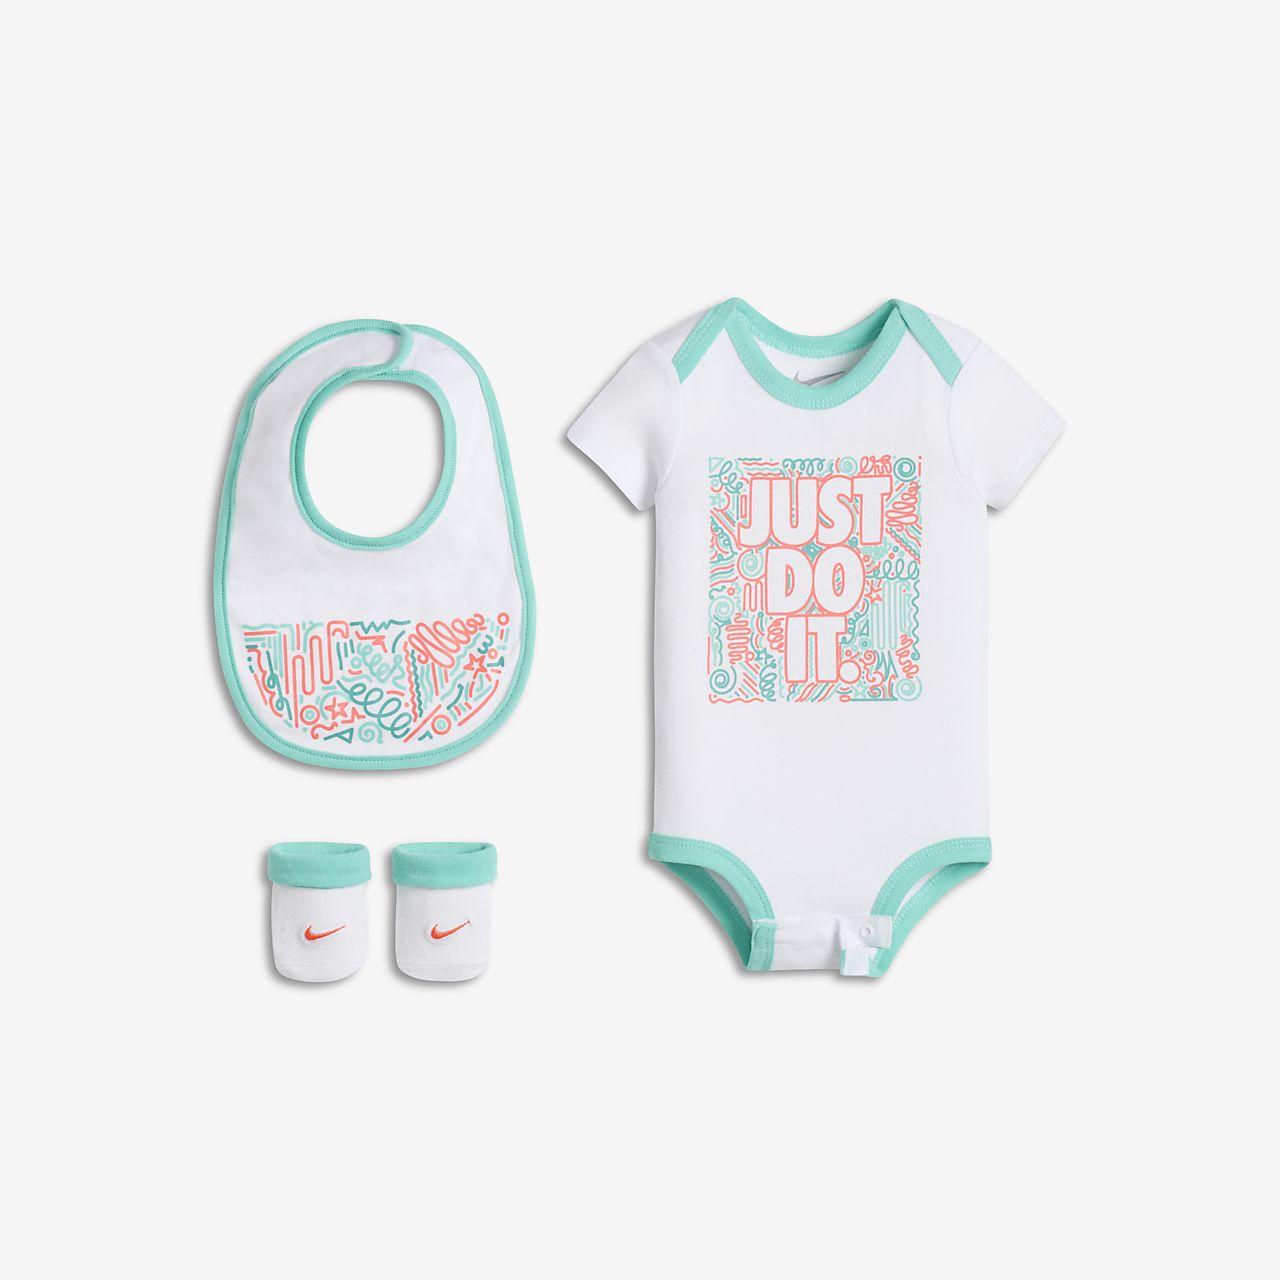 Nike Swoosh Squiggle Three-Piece szett babáknak